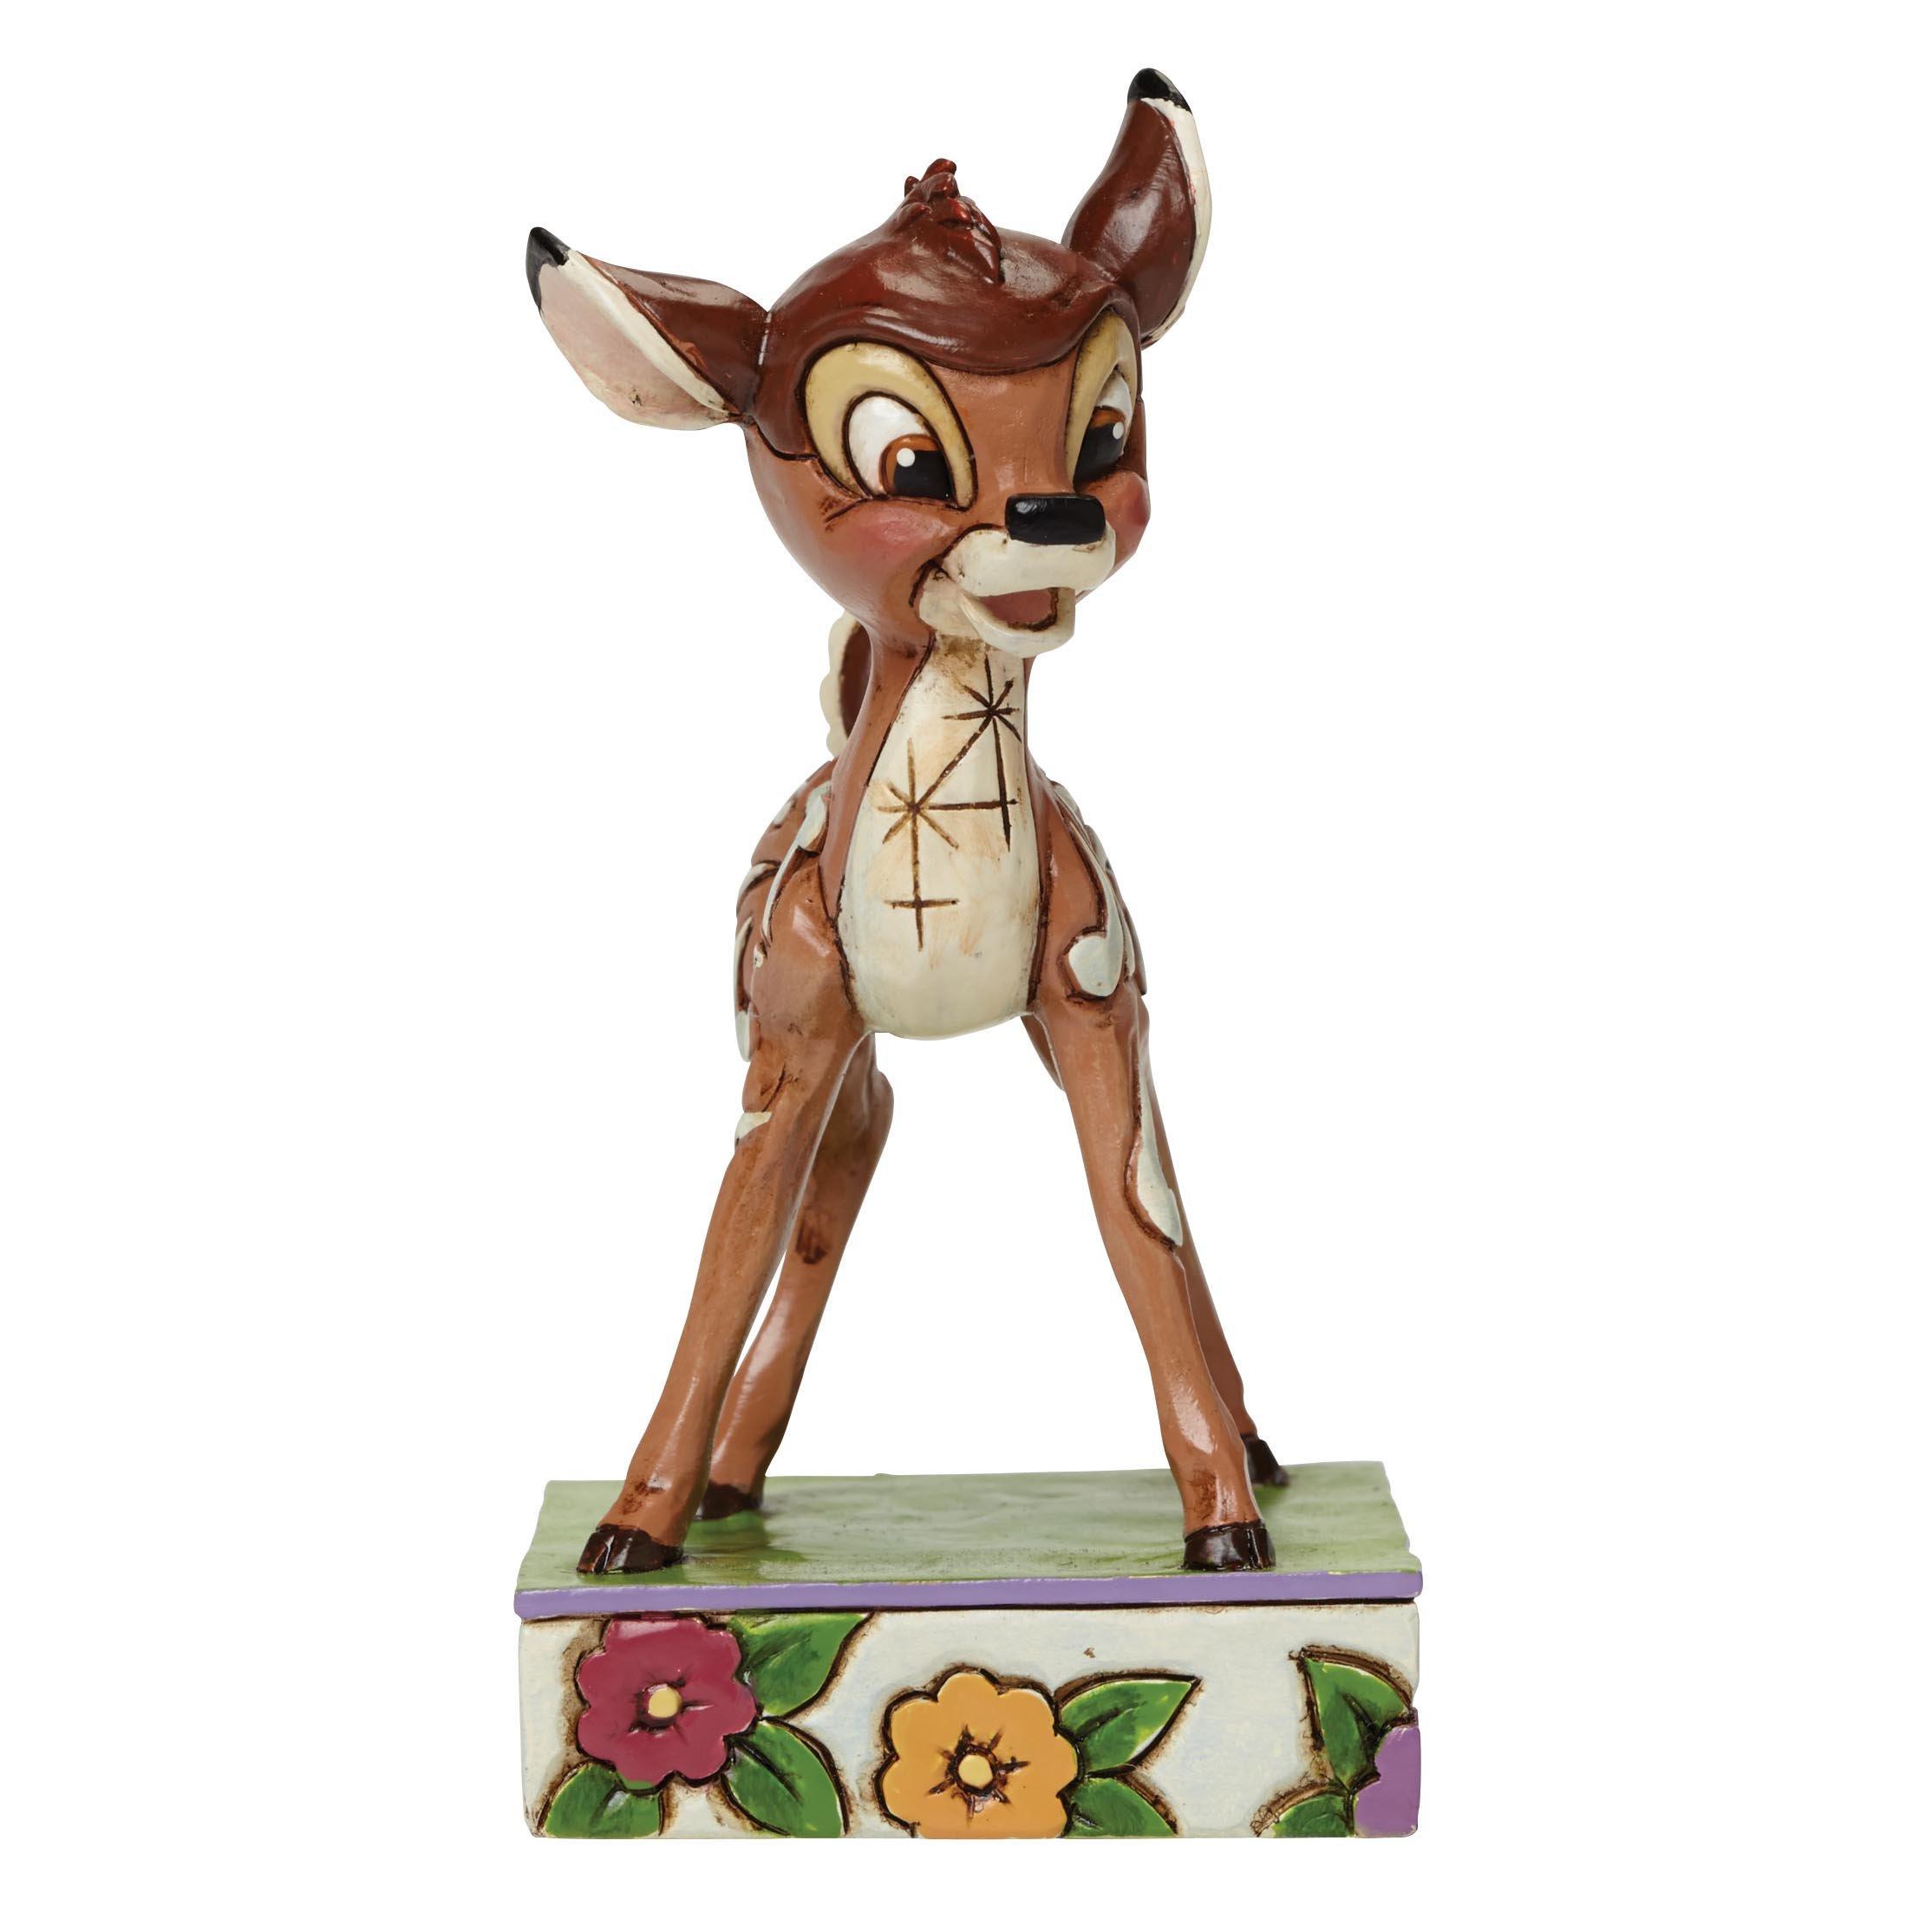 "Jim Shore for Enesco Disney Traditions Bambi Figurine, 3.75"""